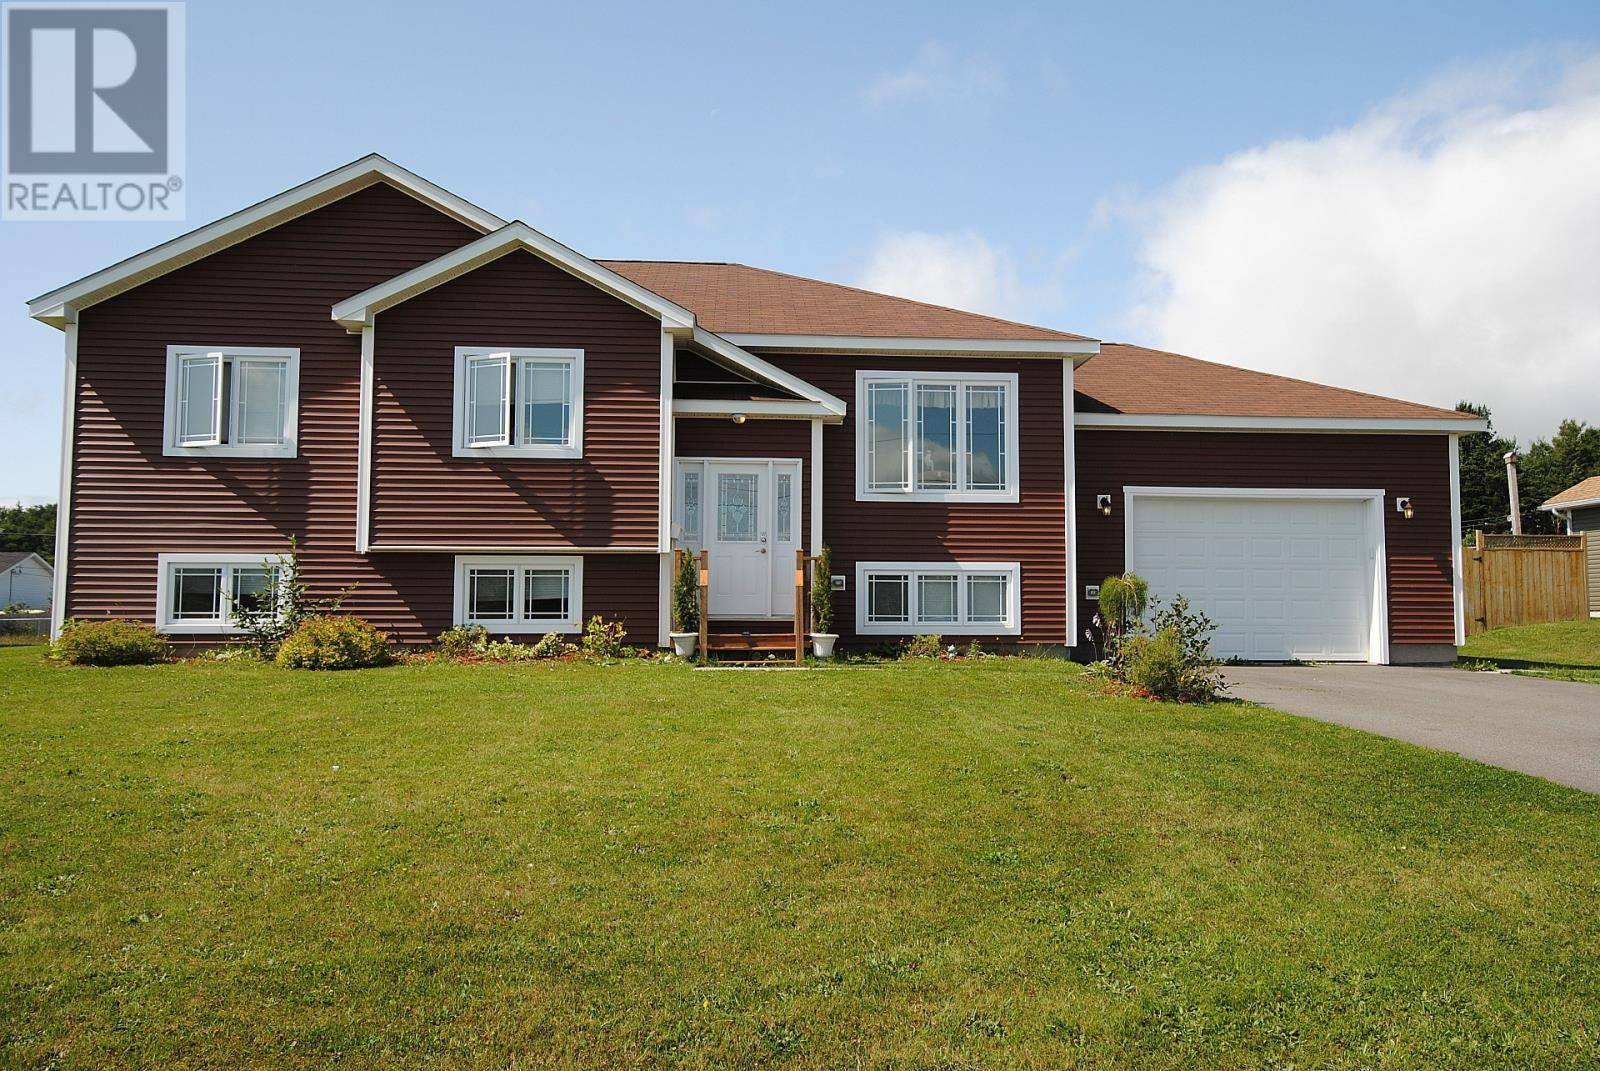 House for sale at 19 Oake Dr Kippens Newfoundland - MLS: 1201221